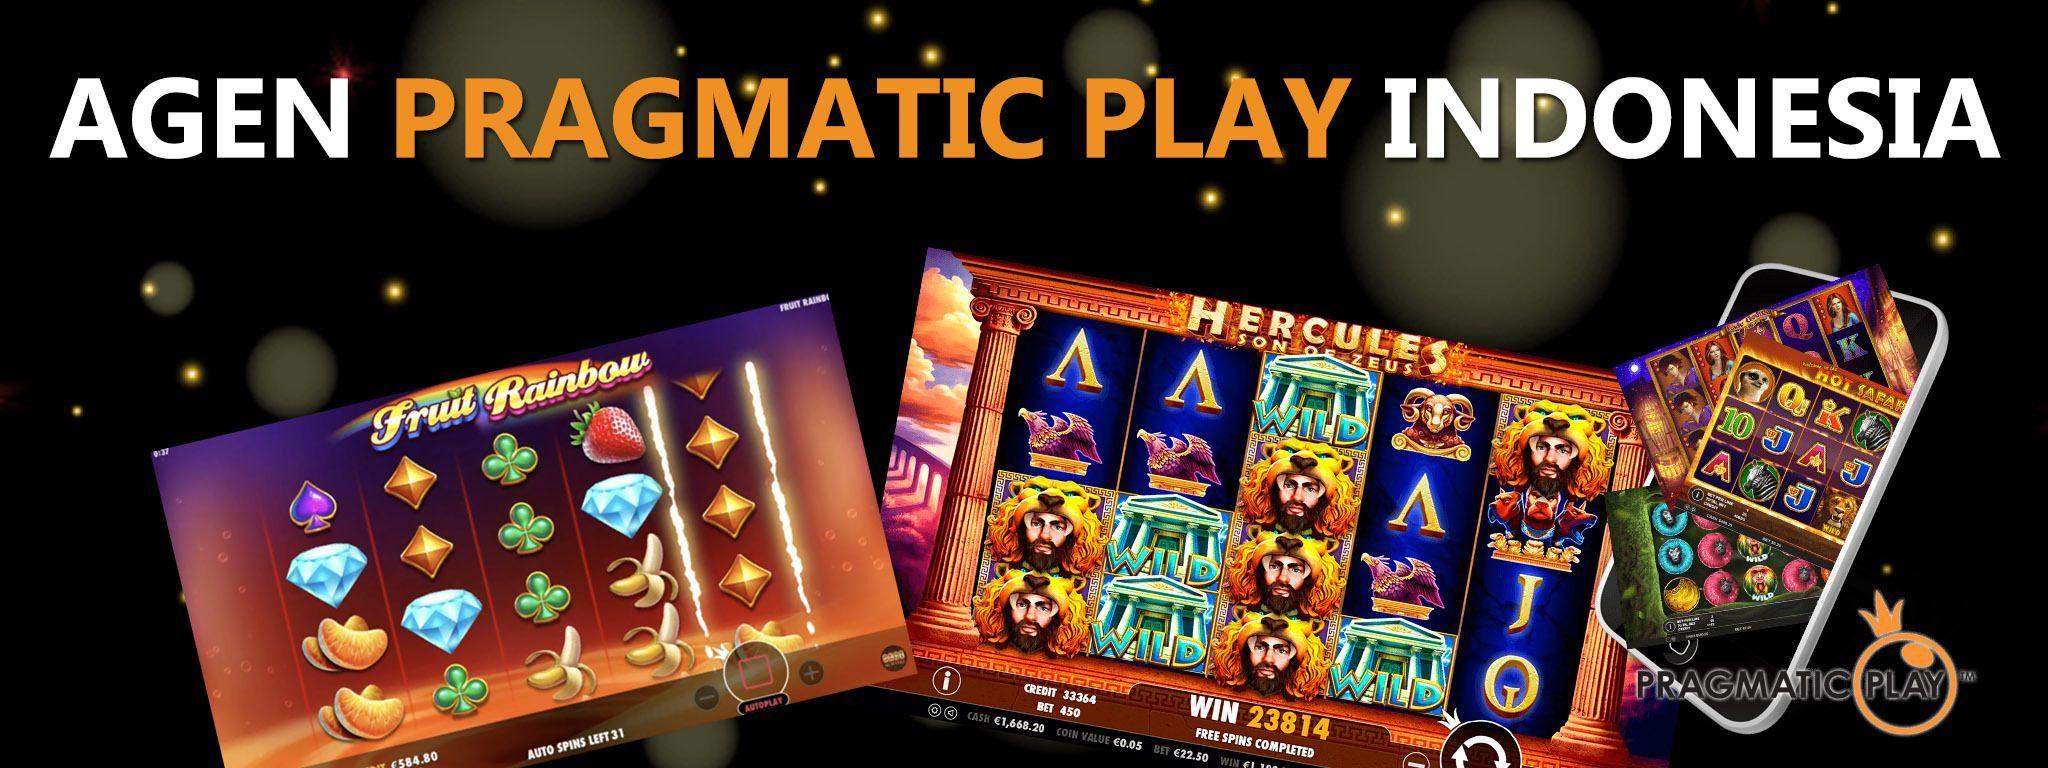 Pragmatic Play Indonesia Casino Online Scatter88 Casino Best Casino Indonesia